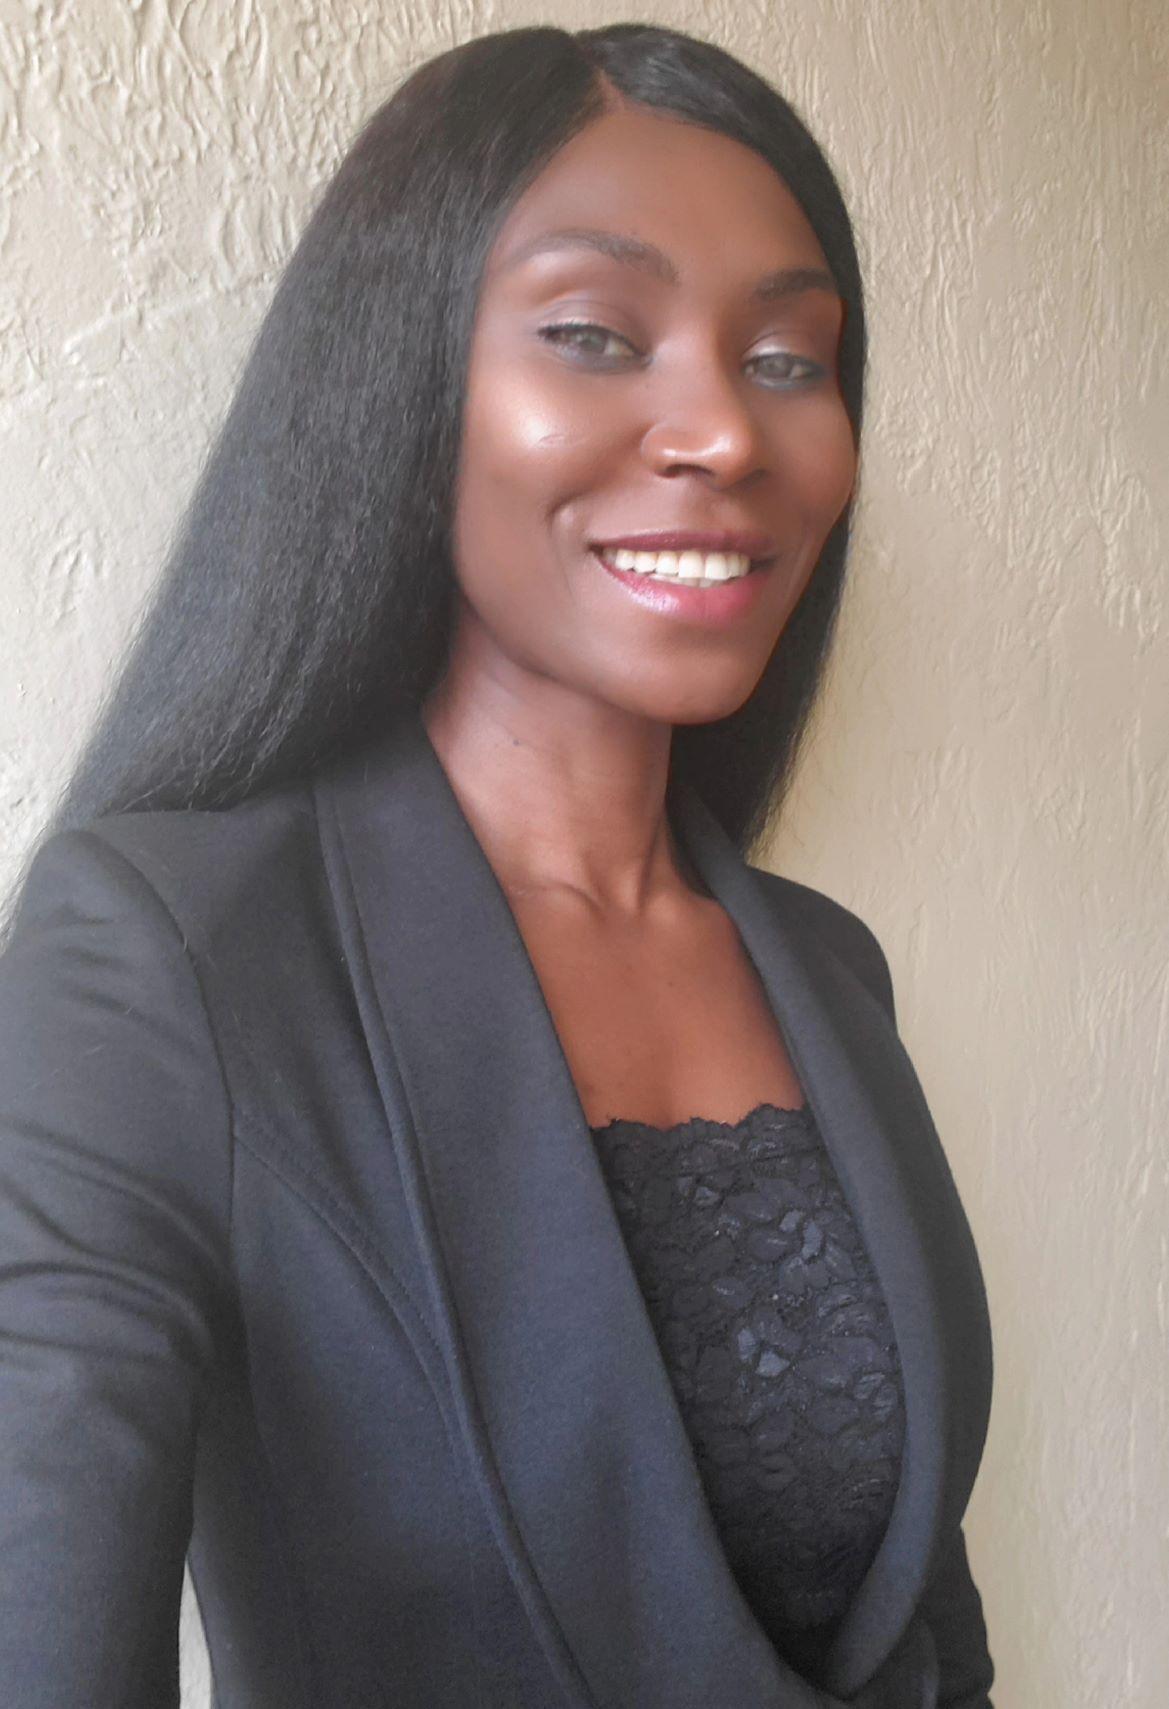 Victoria Agyeman